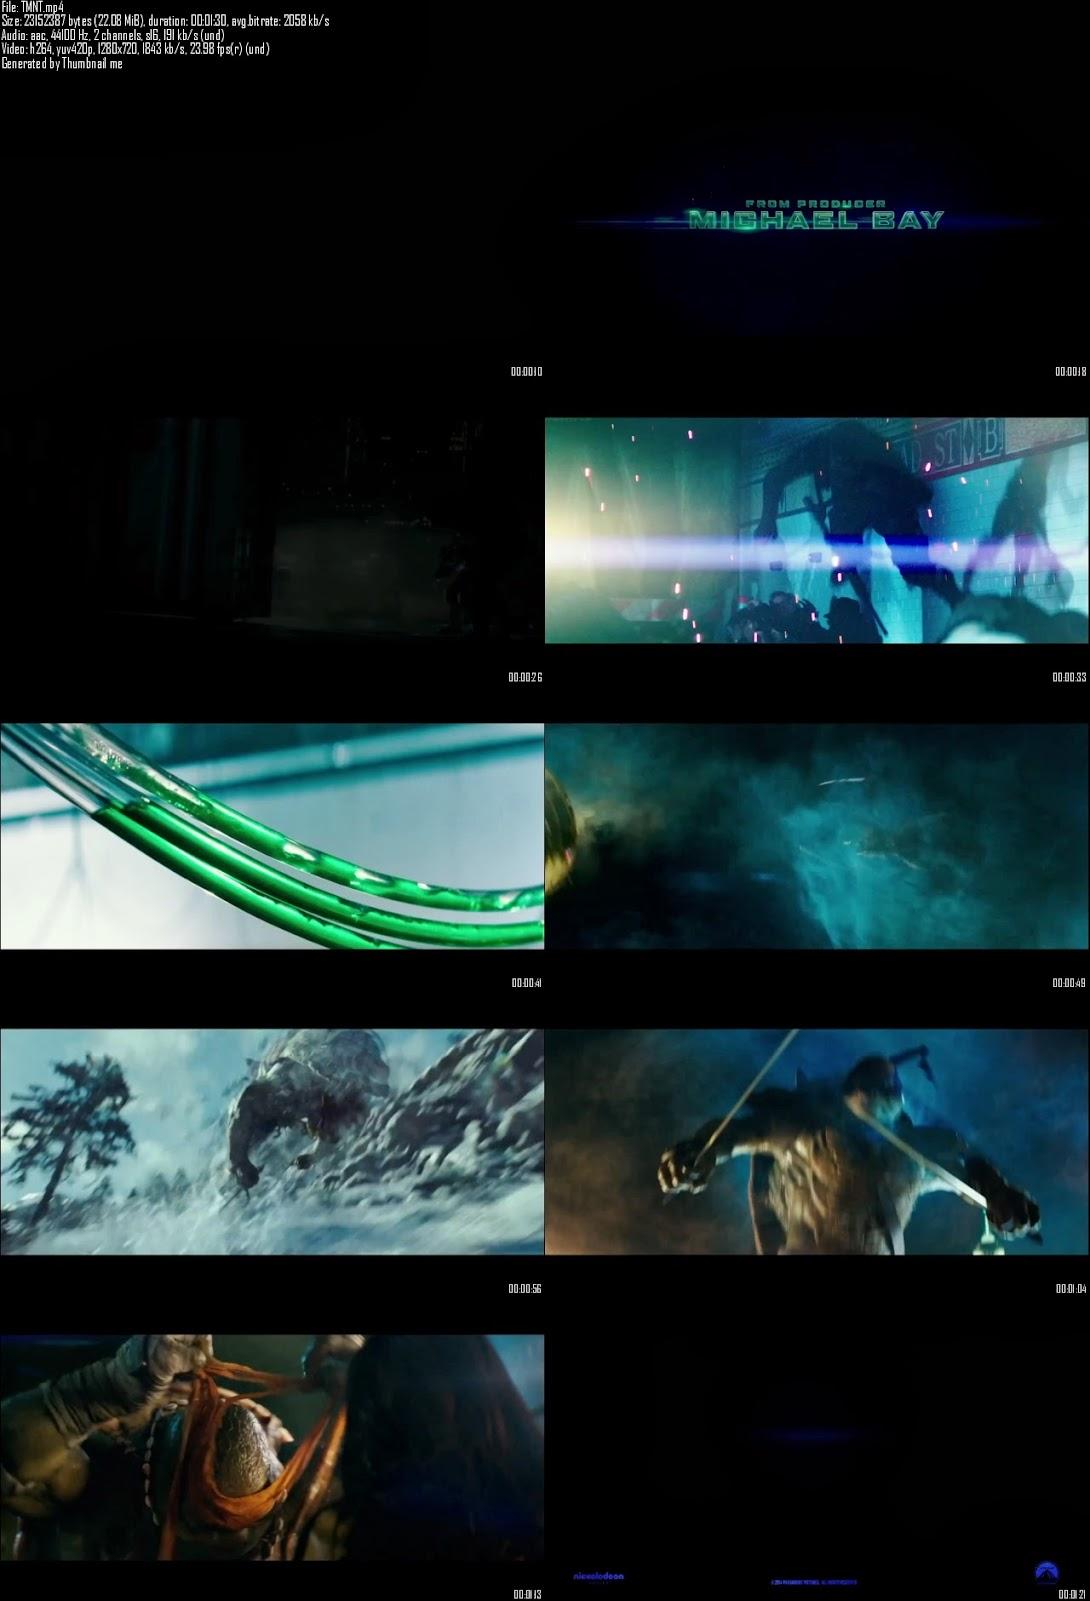 Single Resumable Download Link For Teenage Mutant Ninja Turtles (2014) First Look Promo HD